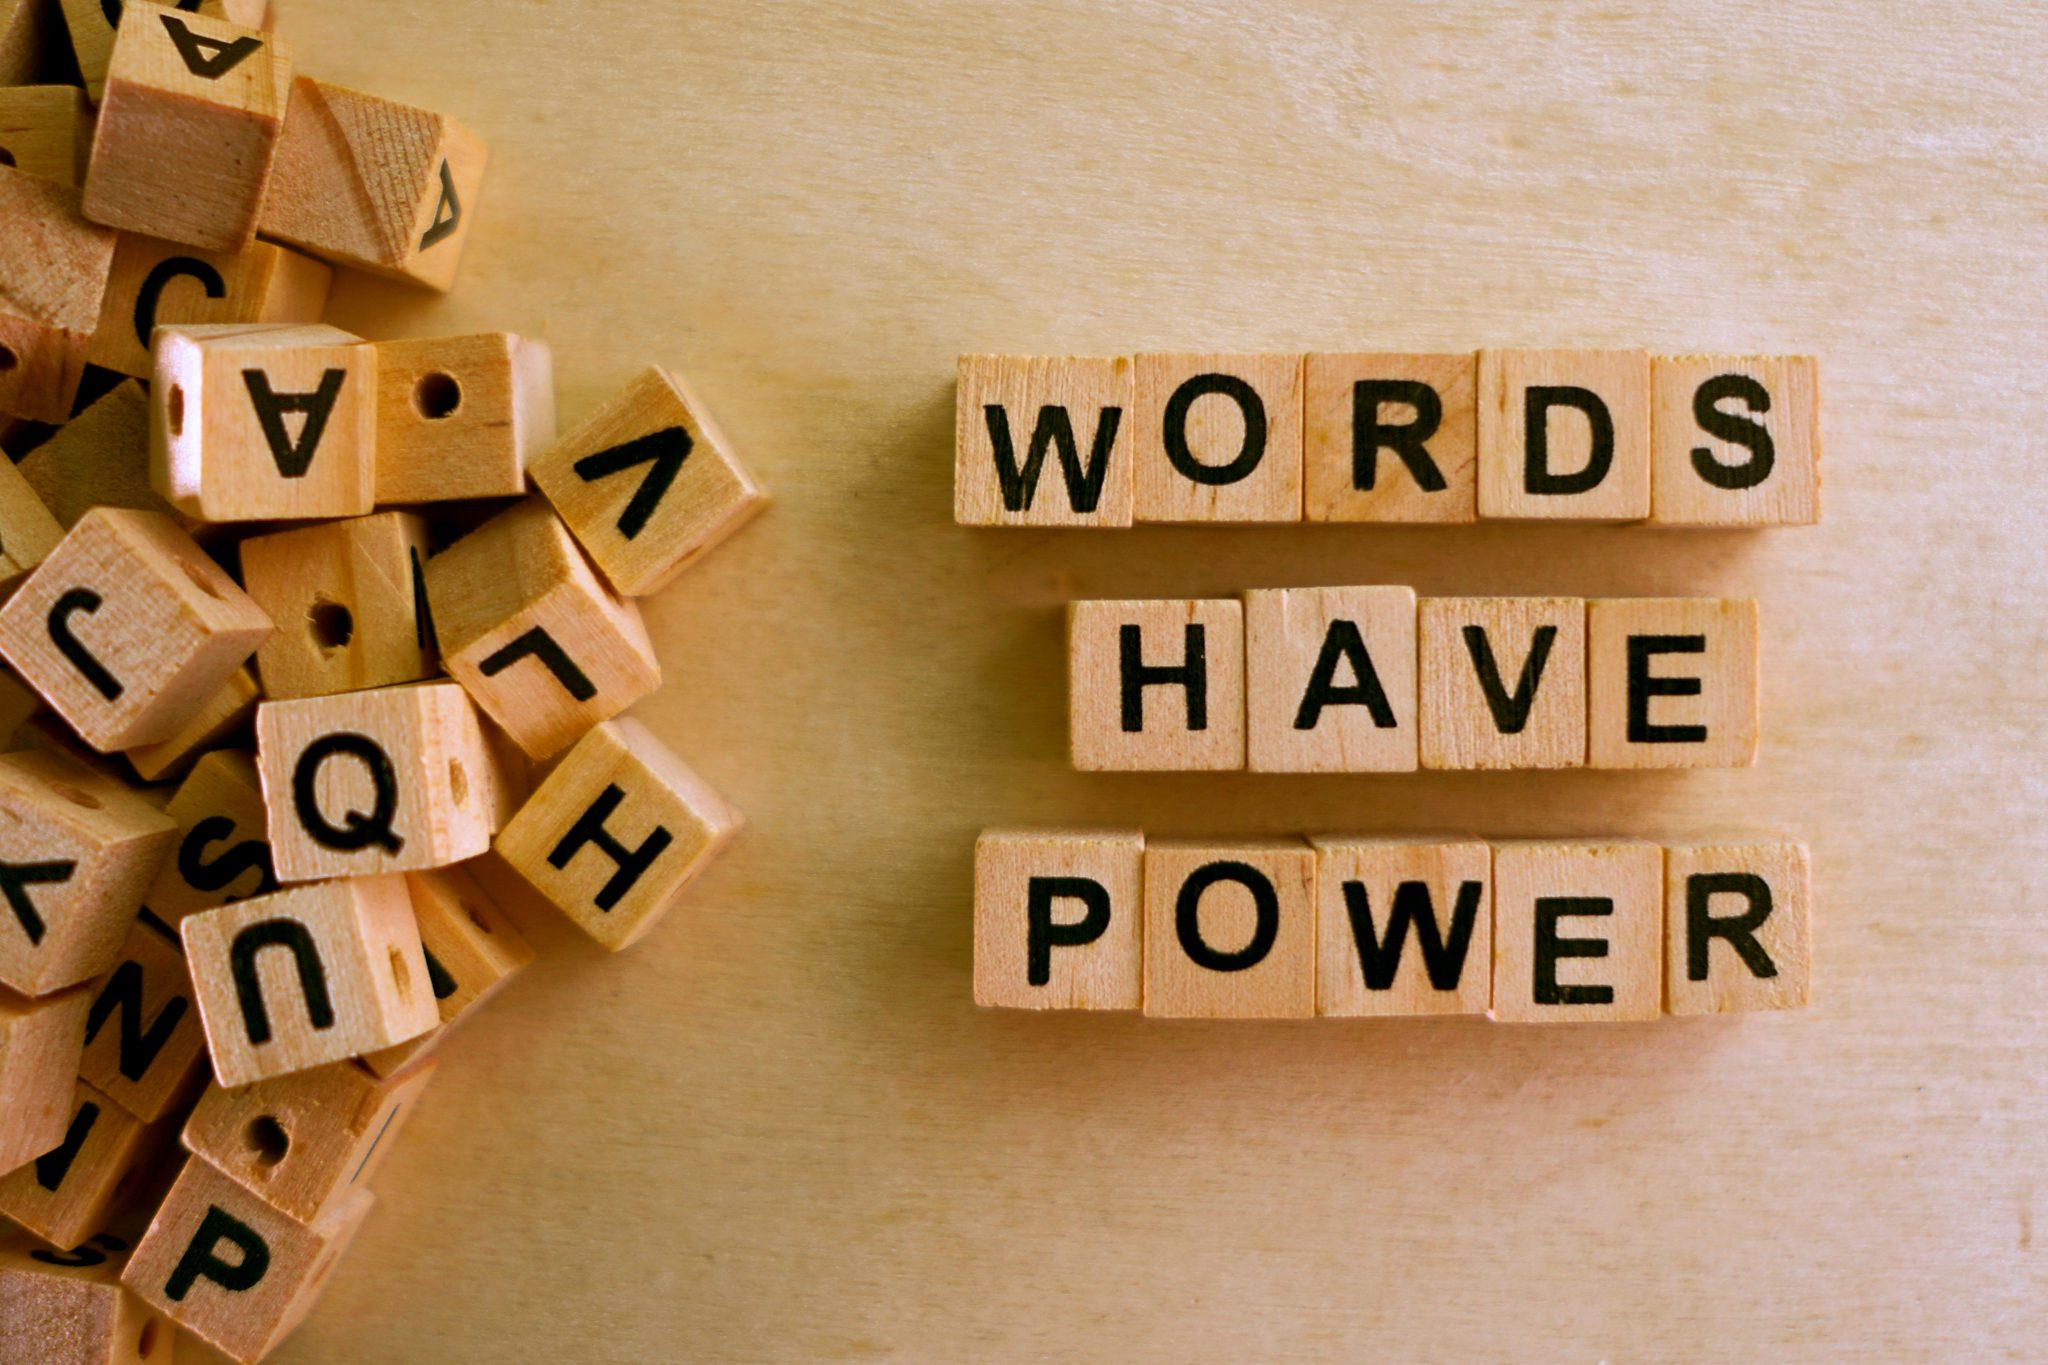 The Words I Claim